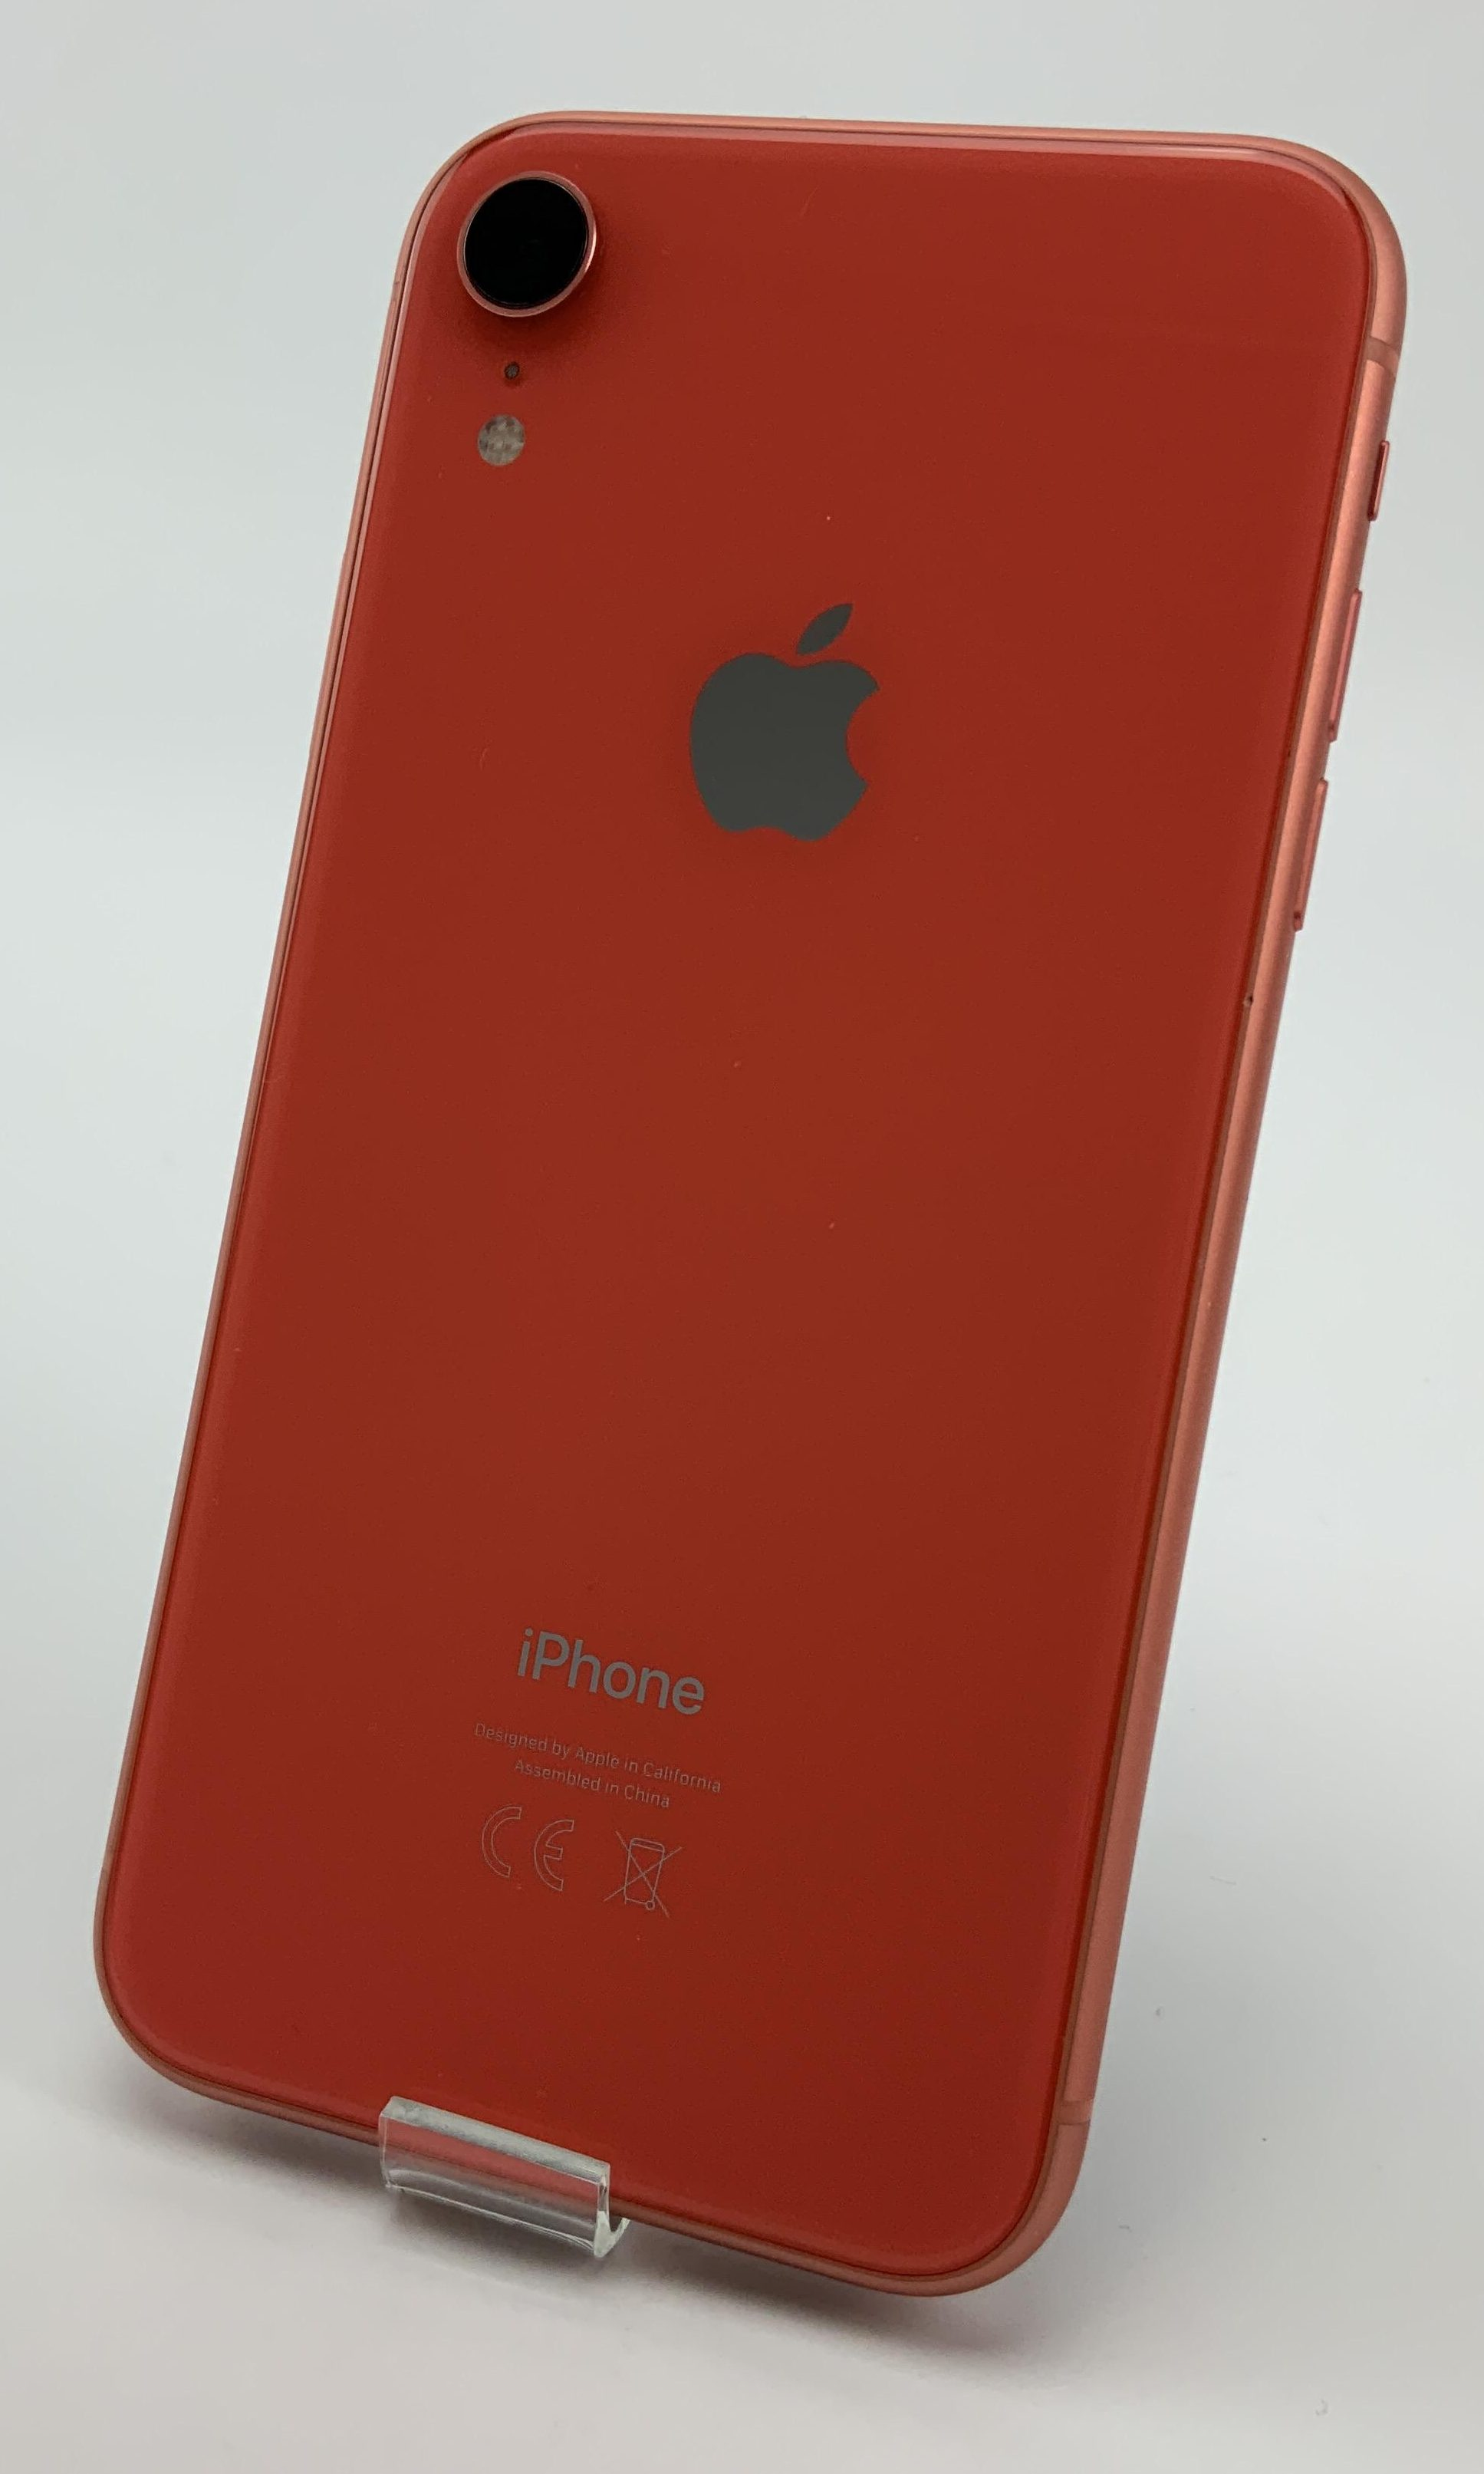 iPhone XR 64GB, 64GB, Coral, immagine 2